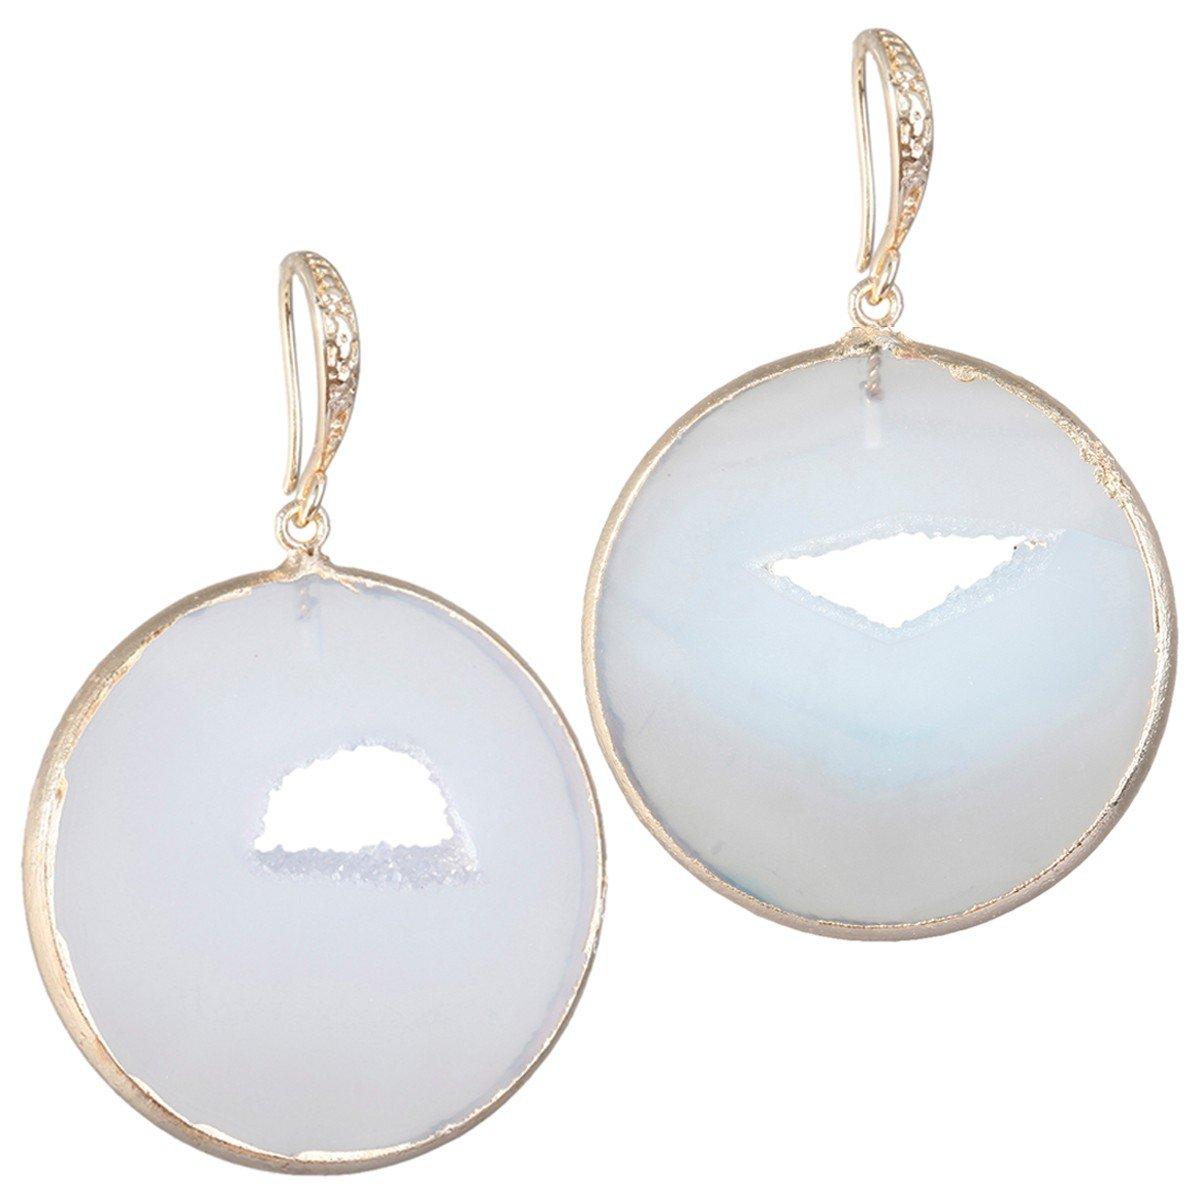 SUNYIK Round Natural Agate Geode Druzy Dangle Earrings for Women